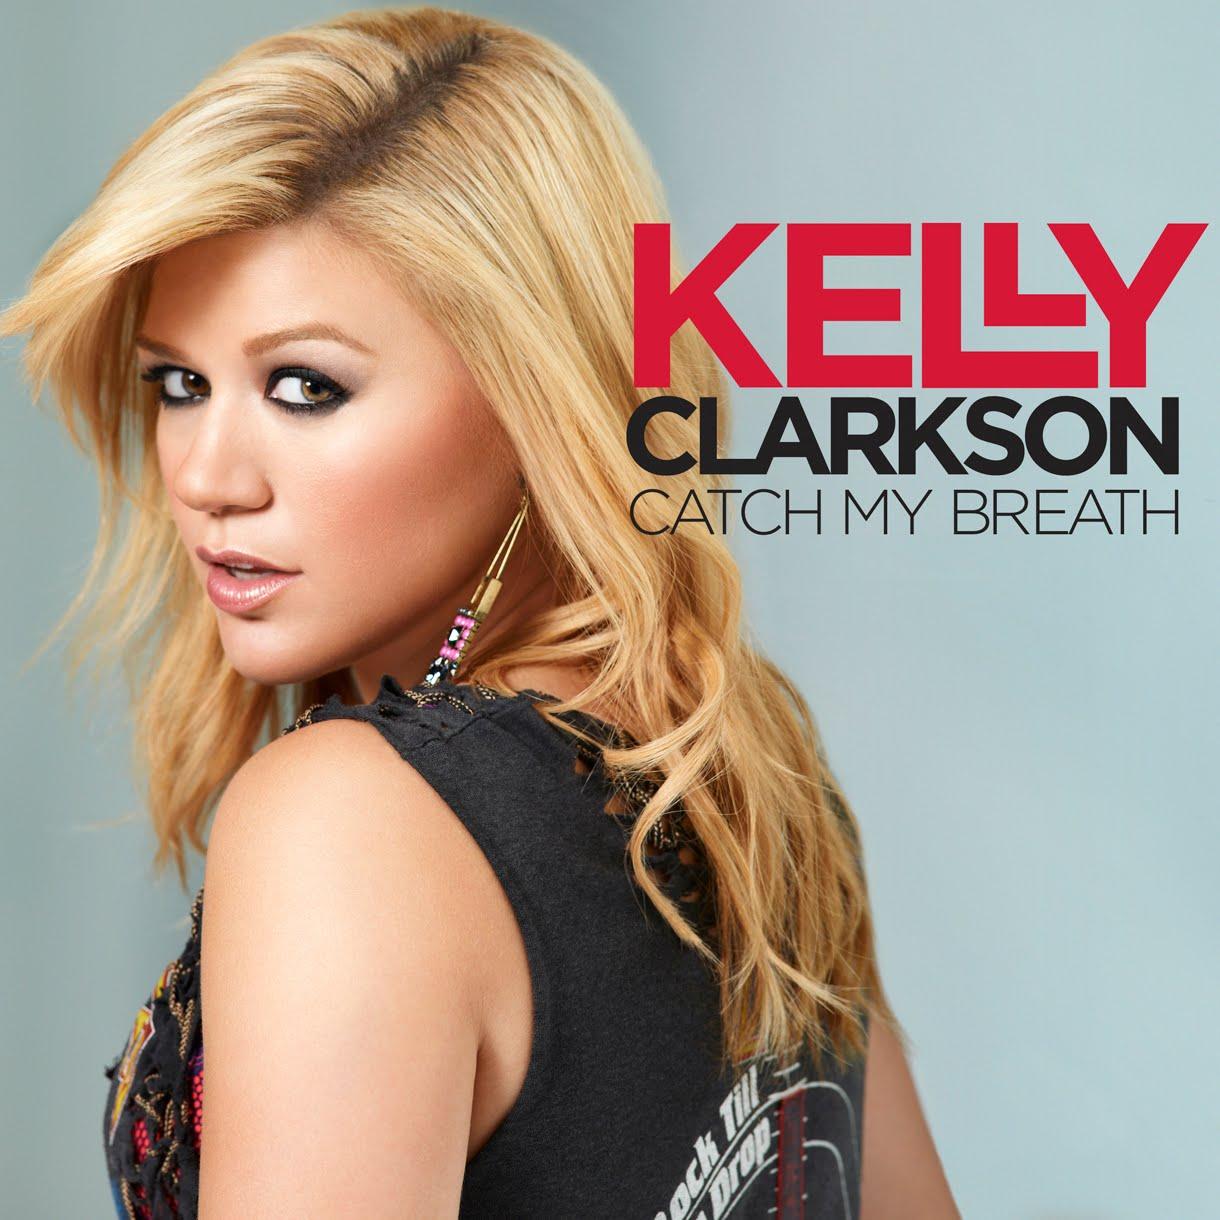 66. Kelly Clarkson - Catch My Breath.jpg